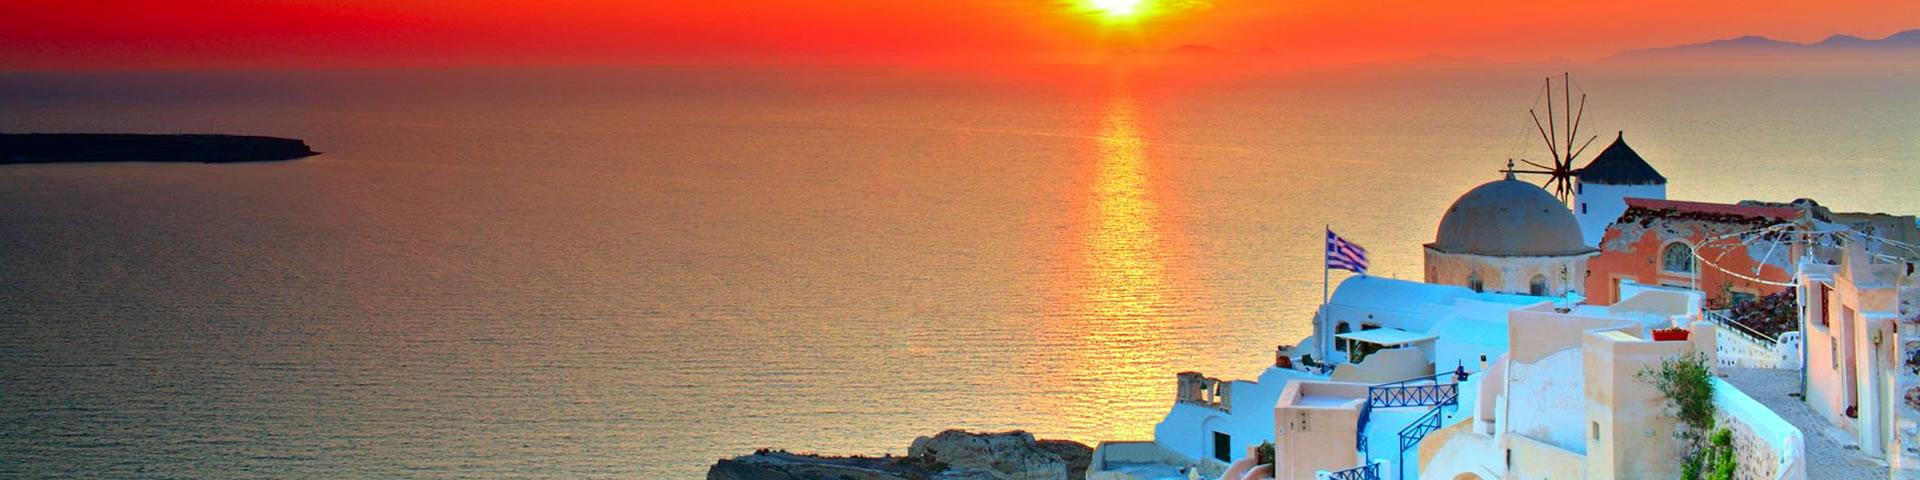 Santorini Famous Sunset